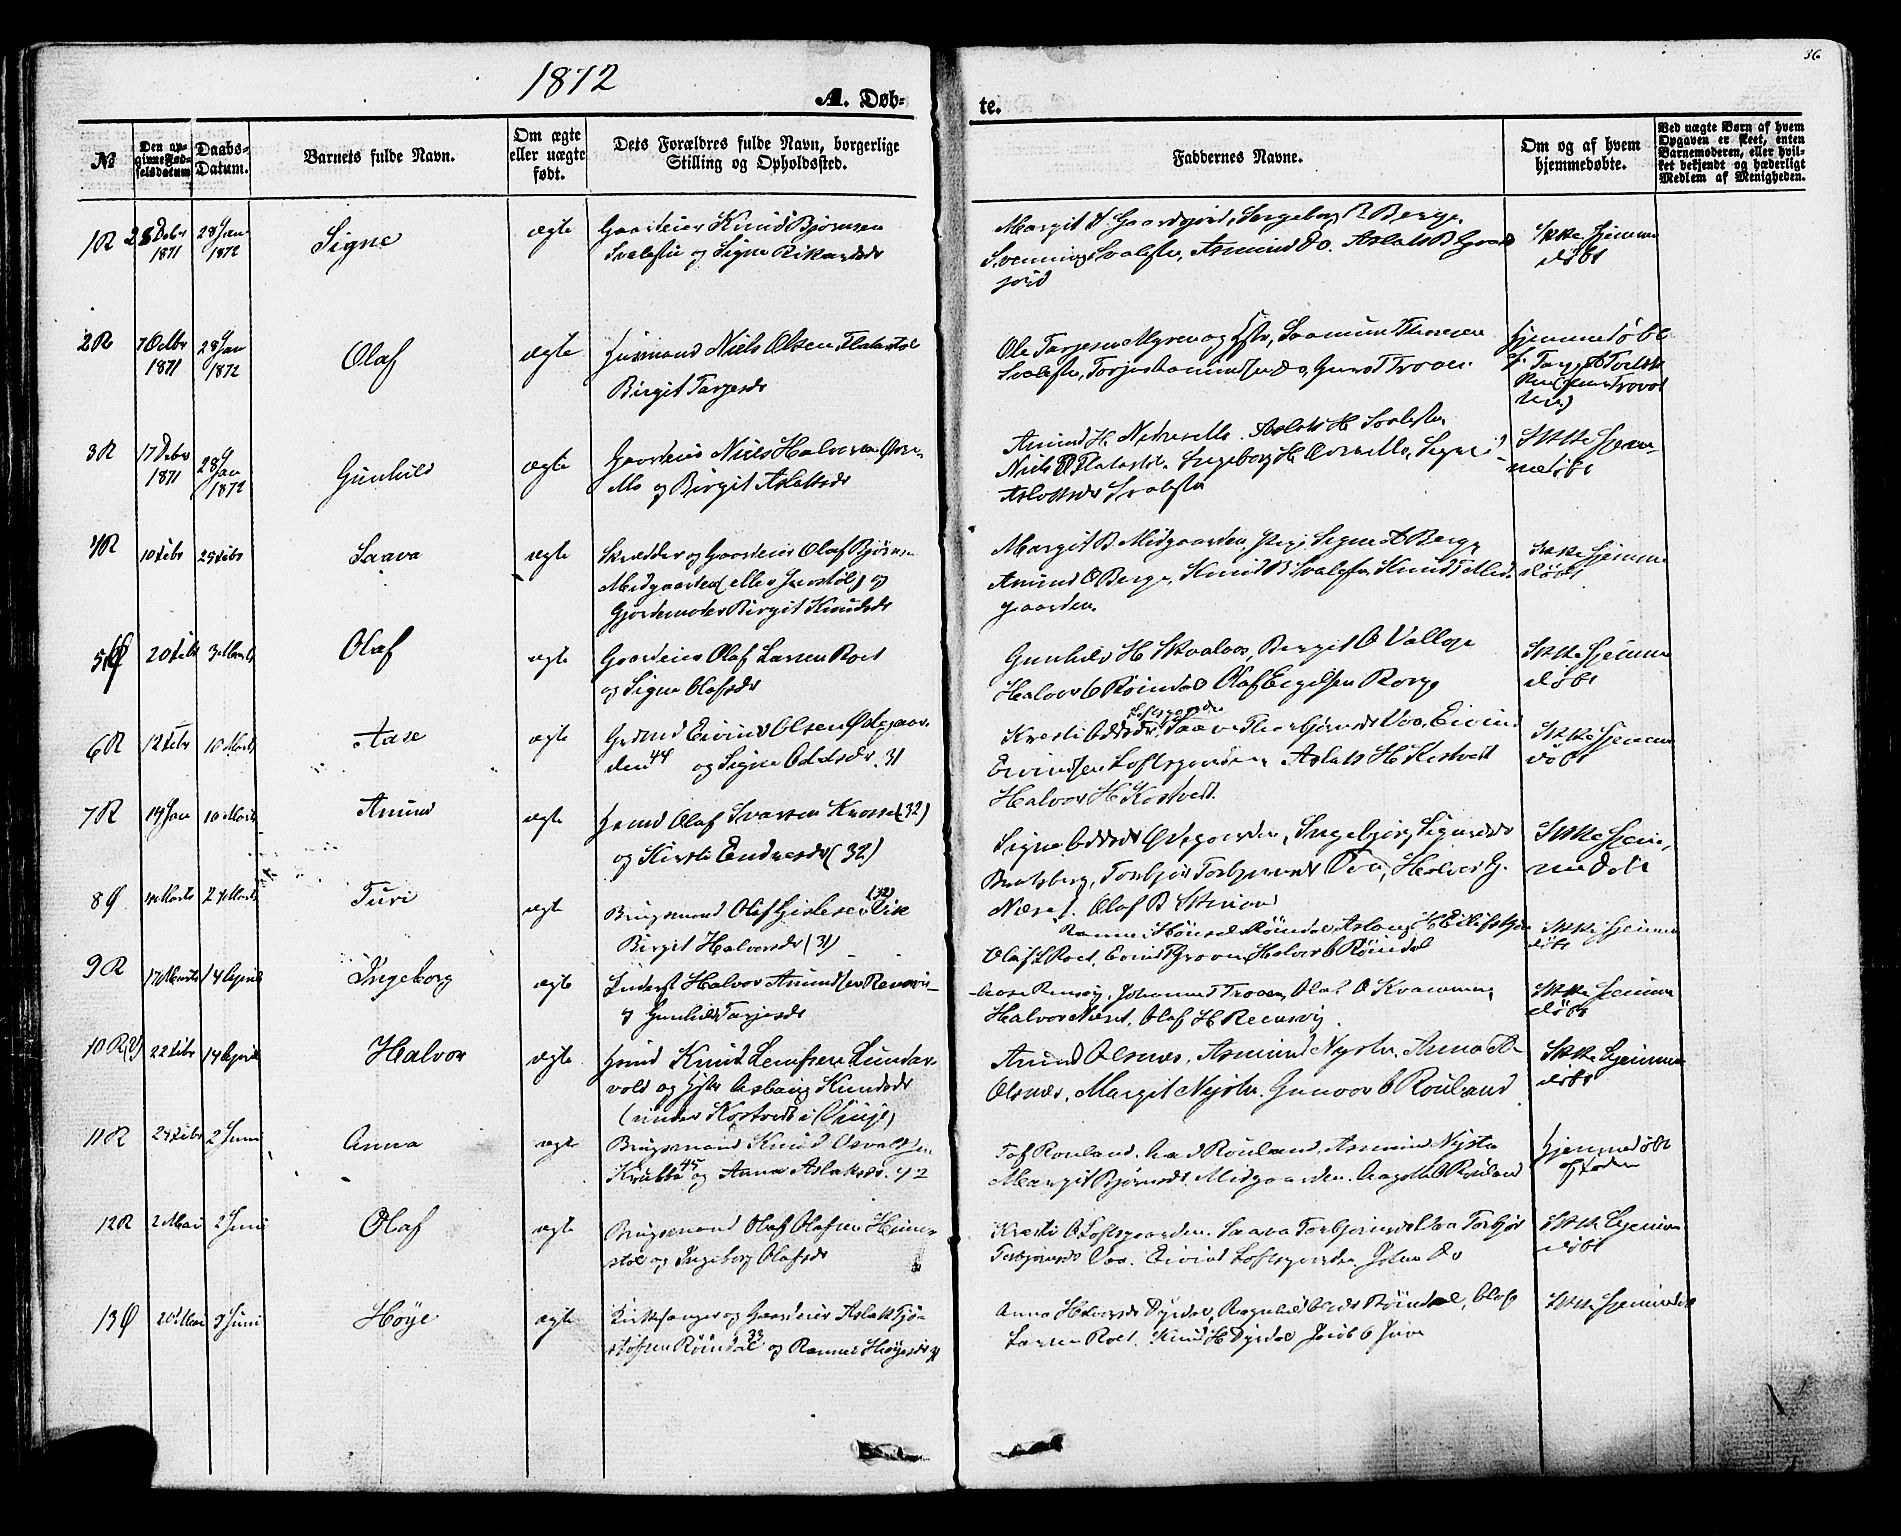 SAKO, Rauland kirkebøker, F/Fa/L0003: Ministerialbok nr. 3, 1859-1886, s. 36